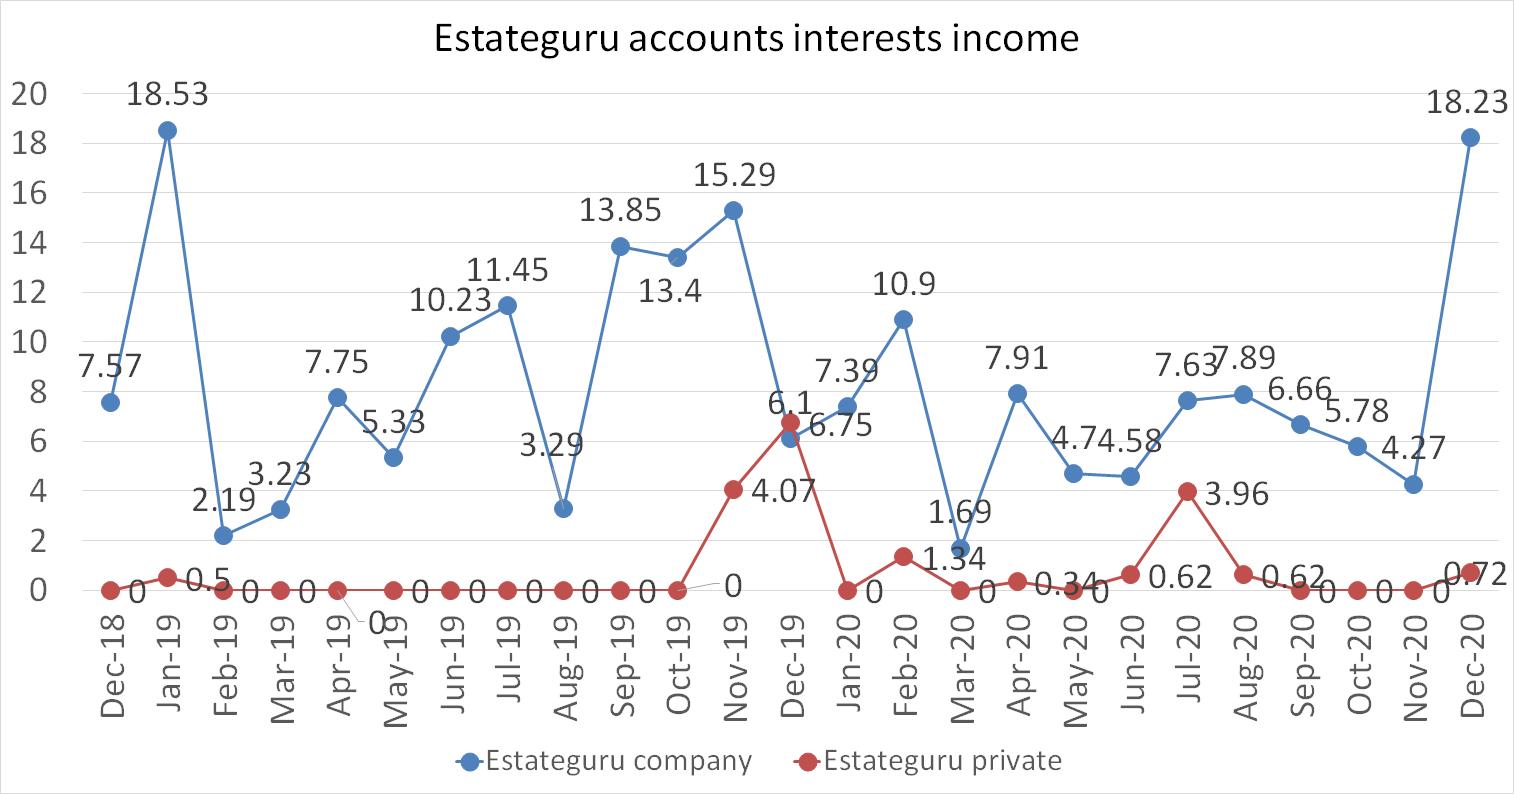 Estateguru accounts interests income in december 2020